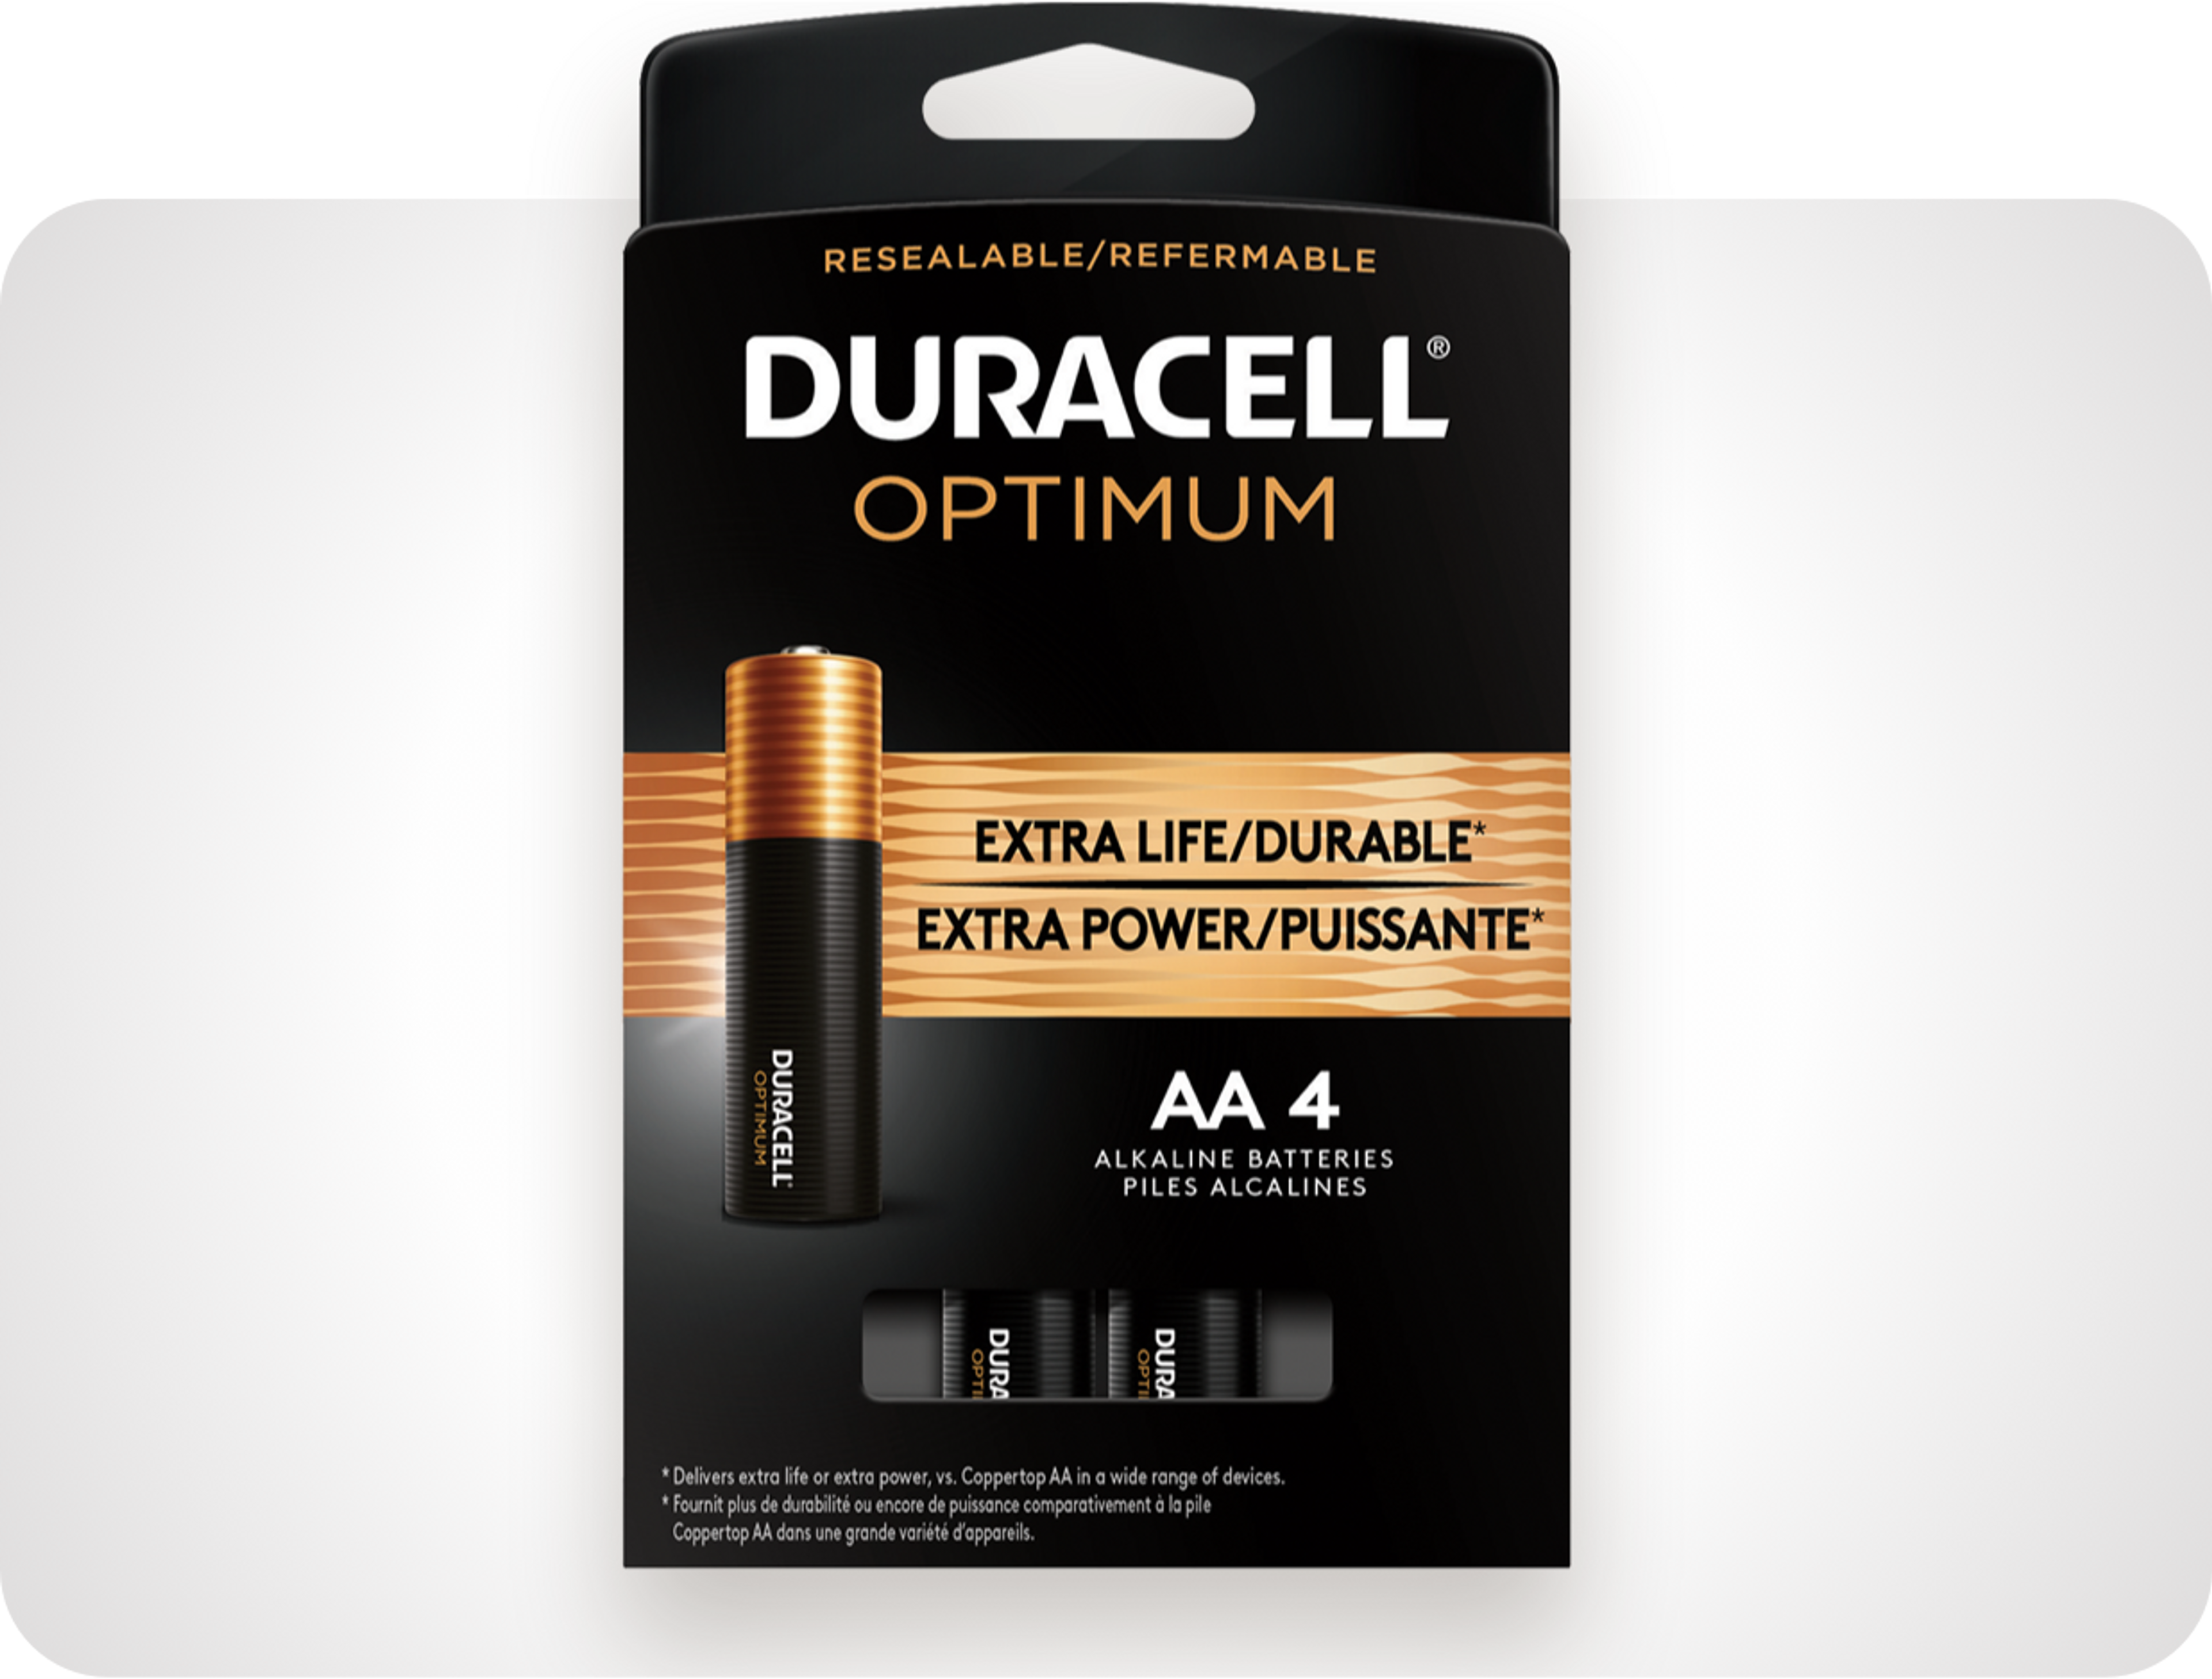 Picture of Duracell® Optimum Alkaline Batteries